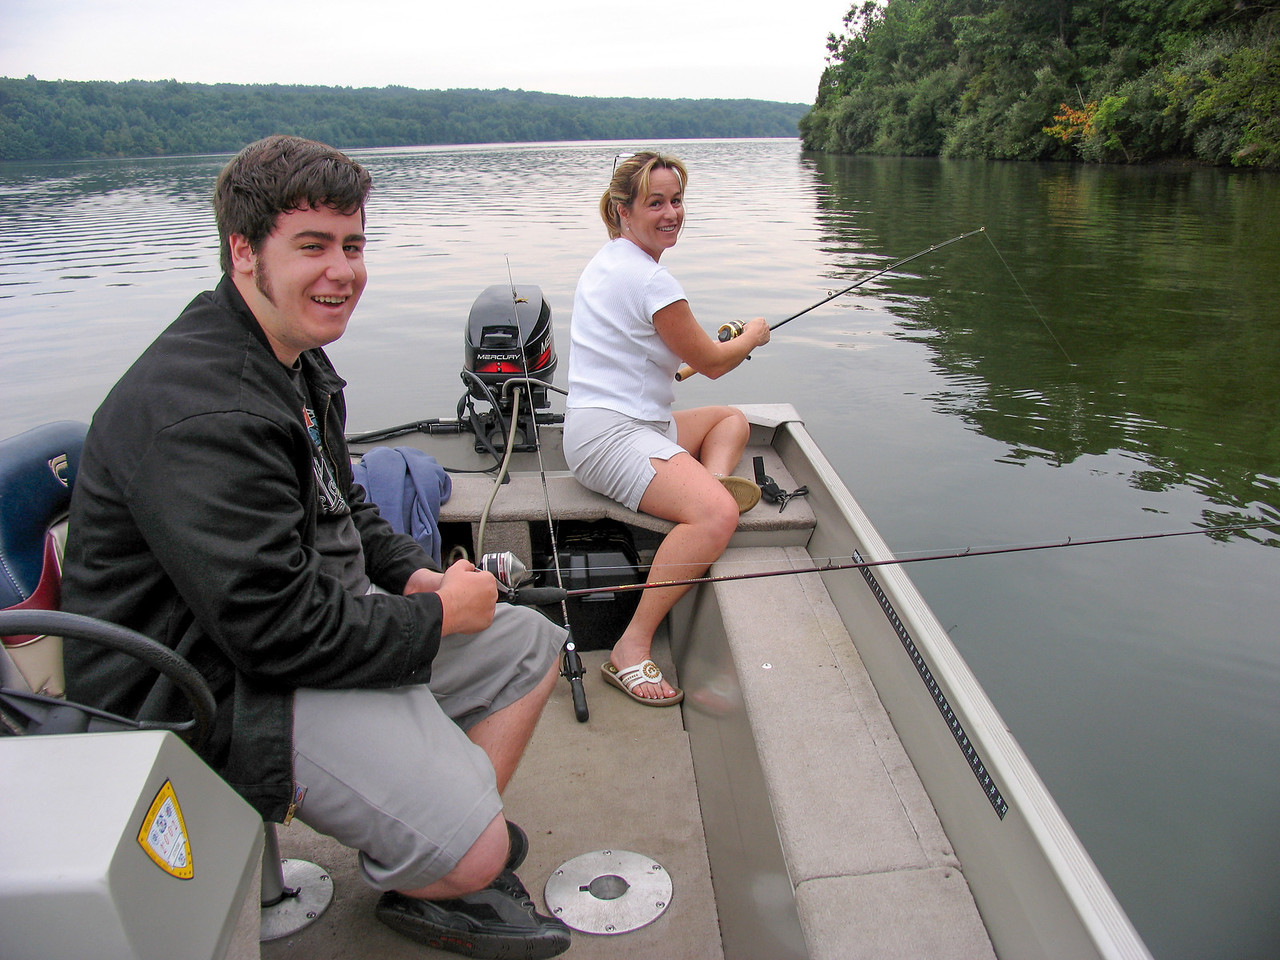 Gina and Jason Martinez at Lake Nockamixon - August 2005